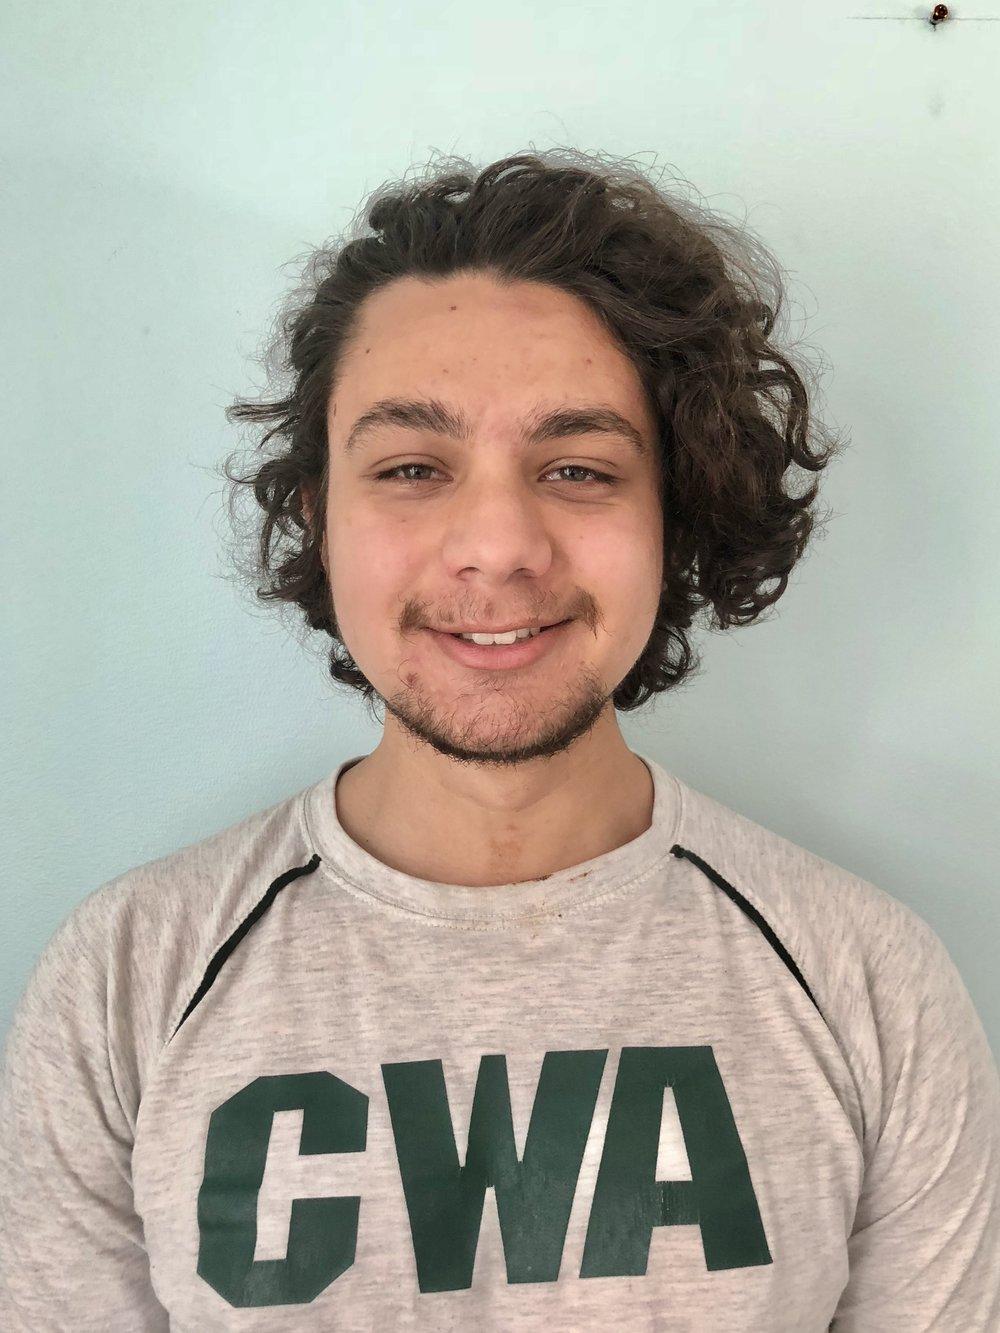 Jonathan  - High school charles wright acad.  - University of redlands  - igem member 2017-2018